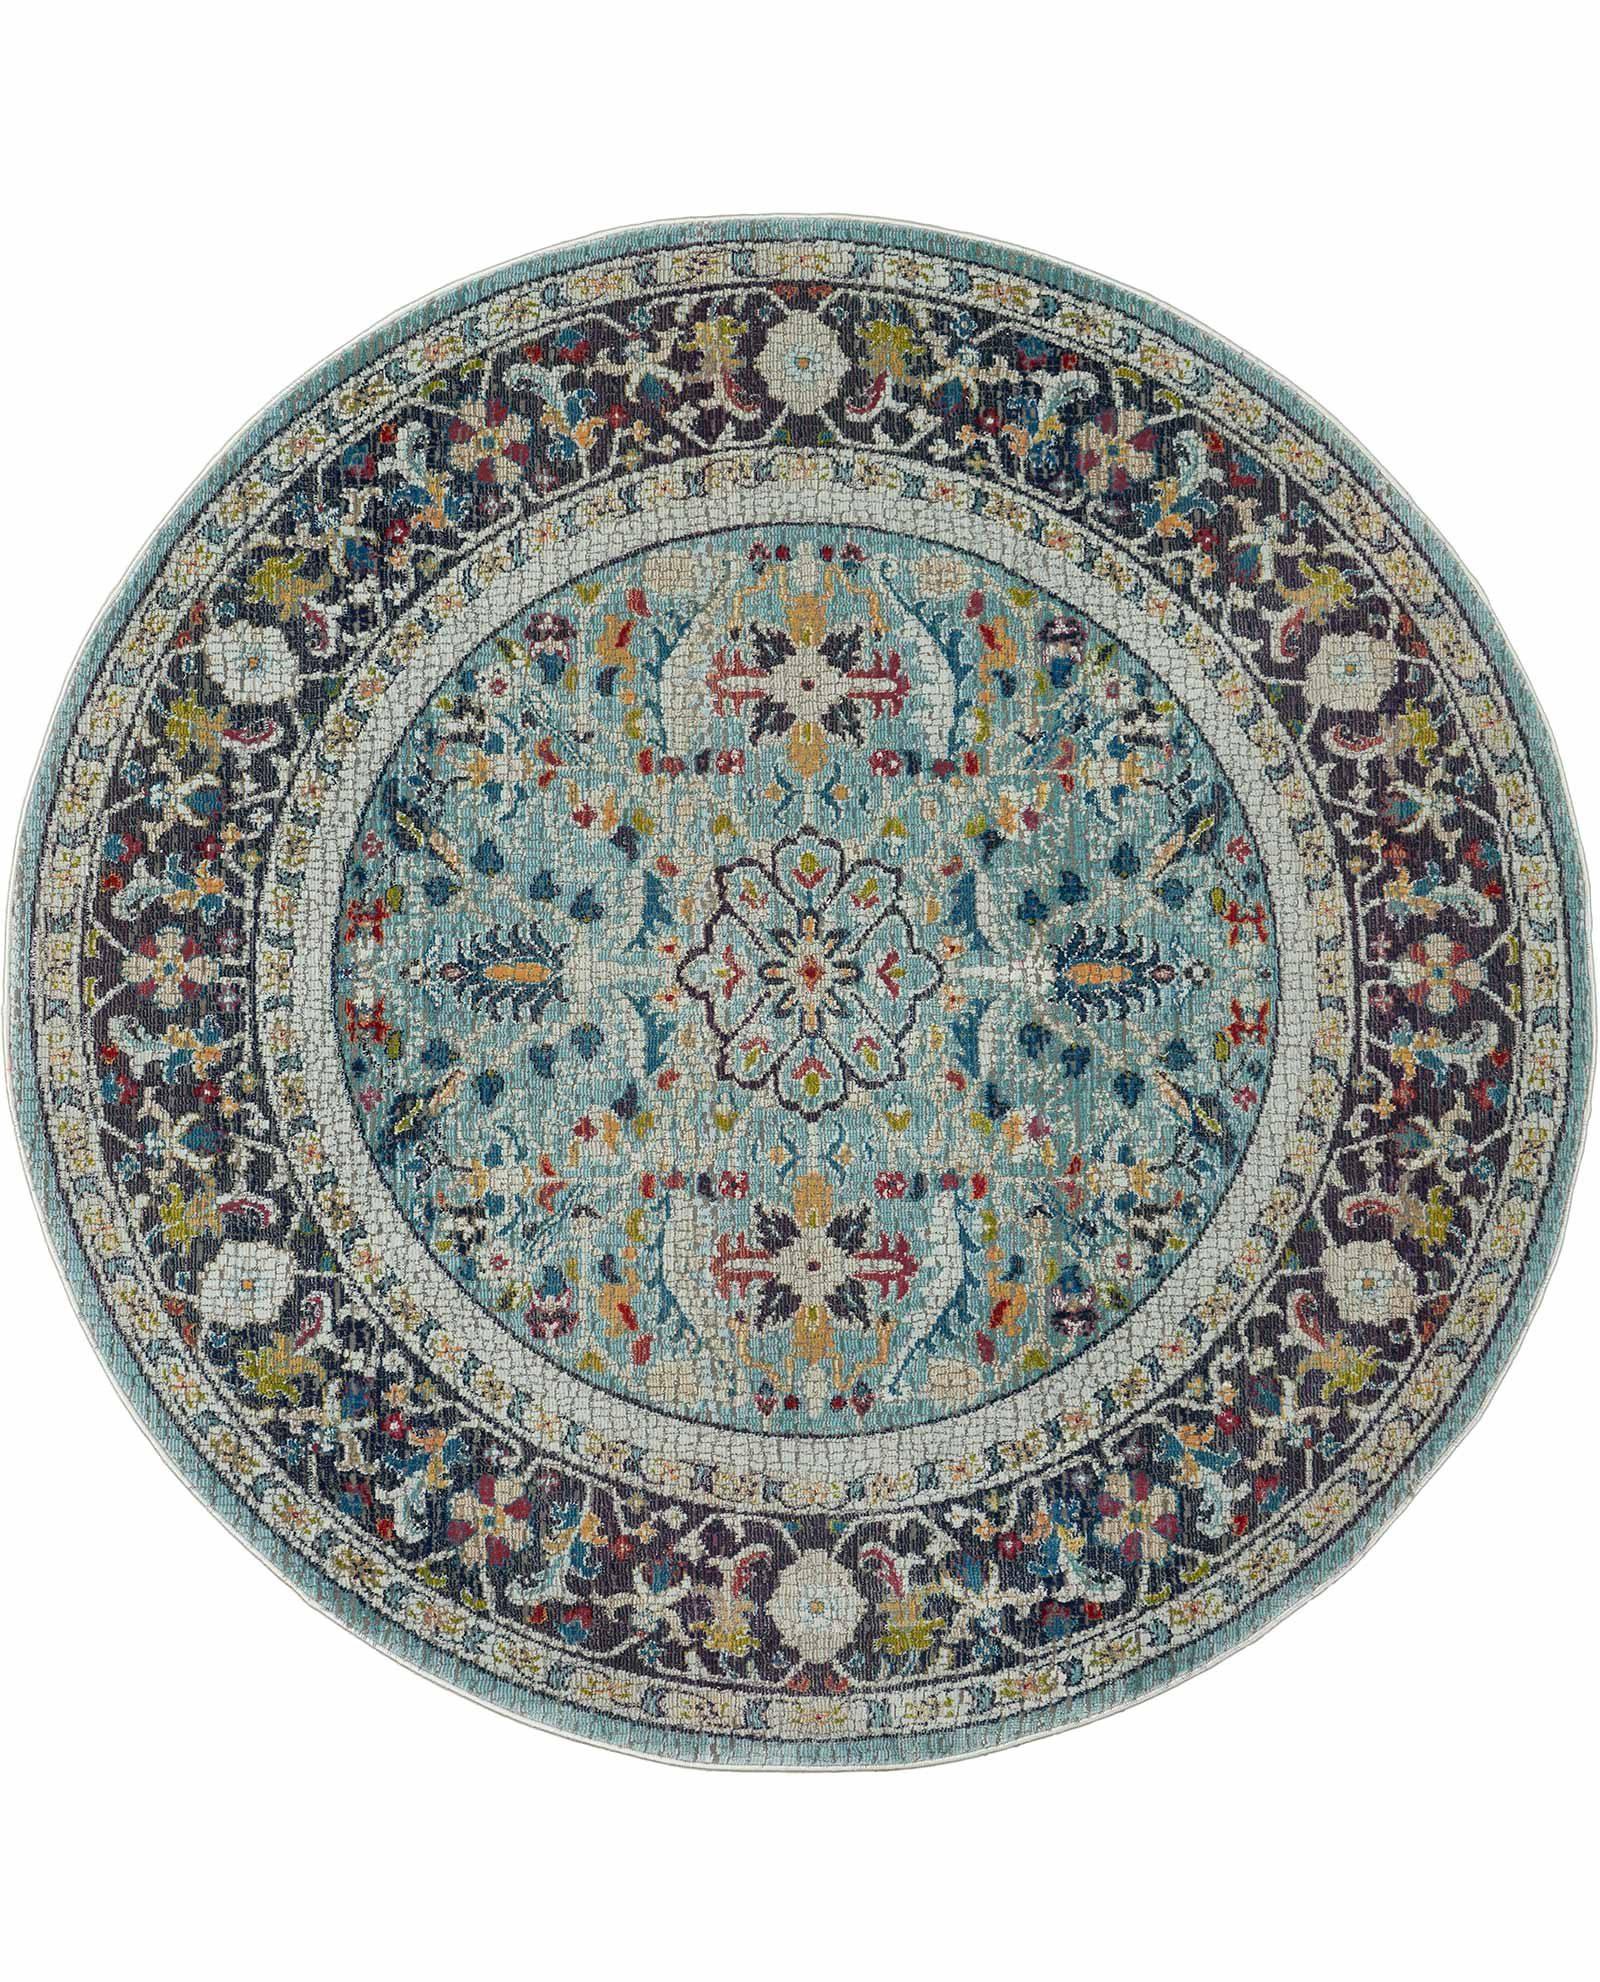 Nourison rug Ankara Global ANR14 TEAL MULTI 4xRND 099446498427 flat C